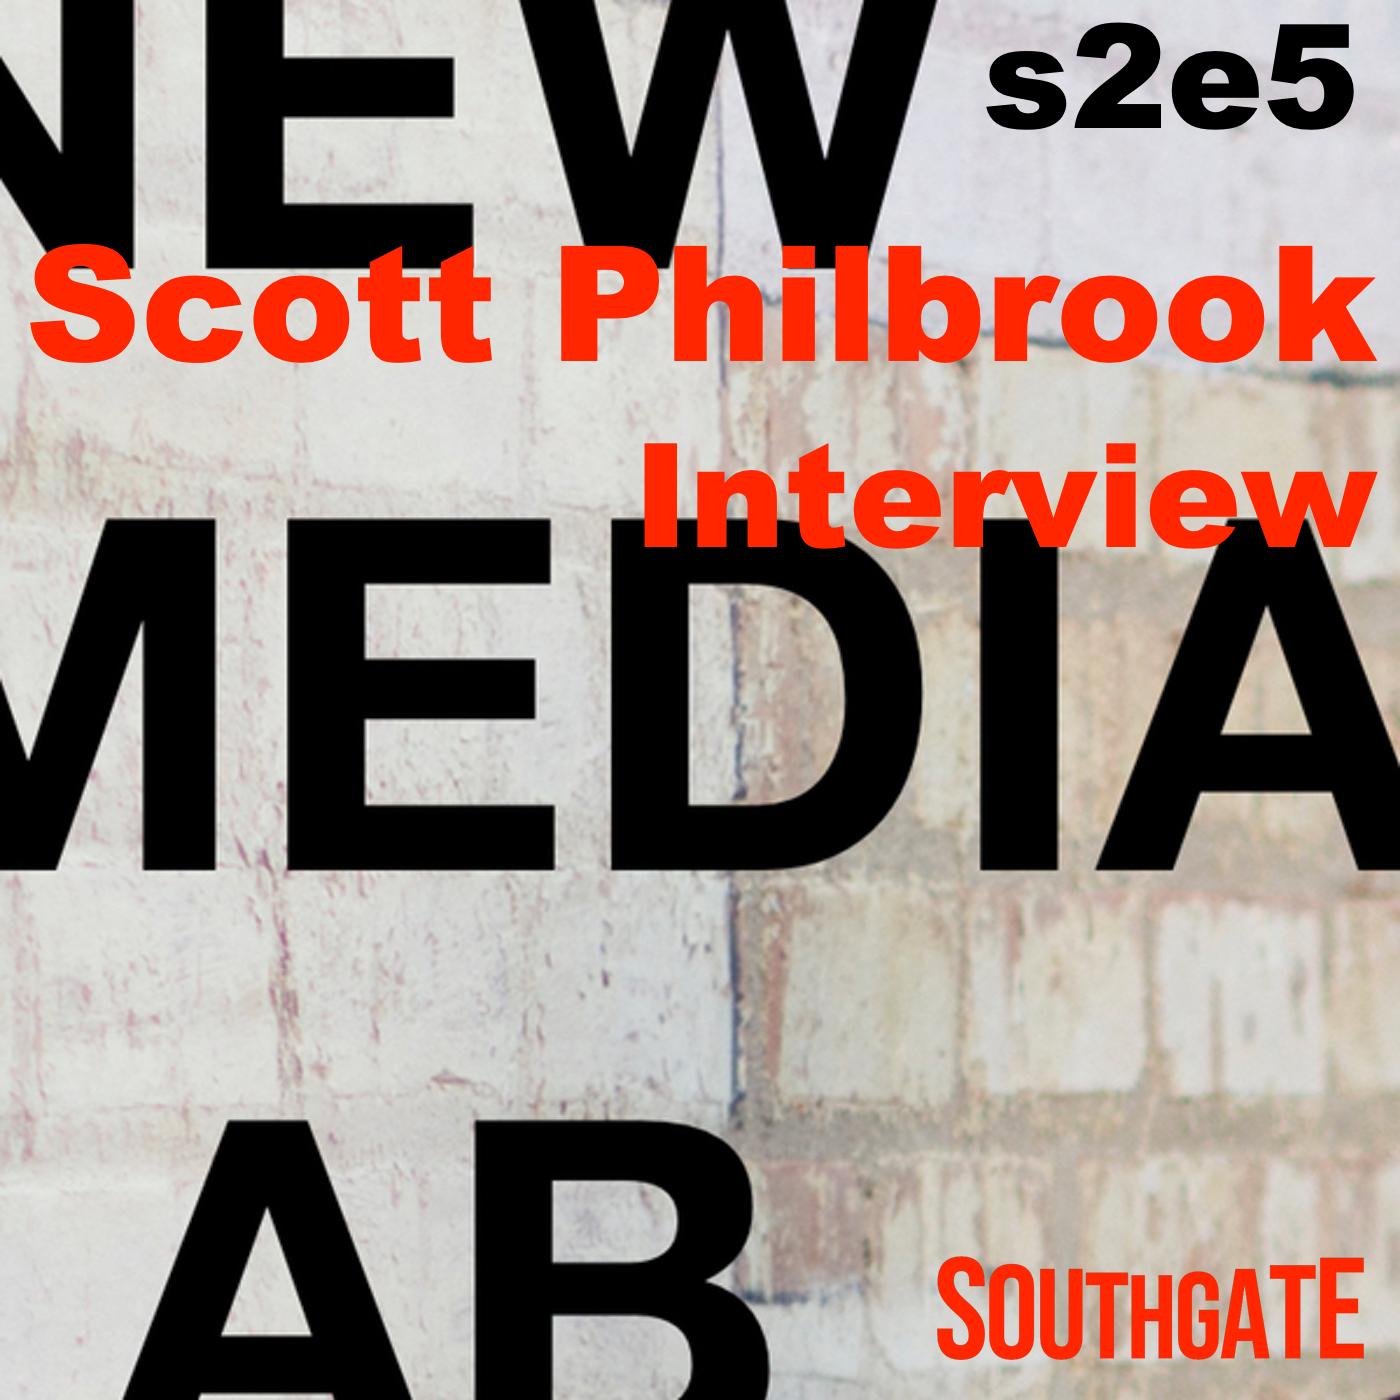 Scott Philbrook Interview